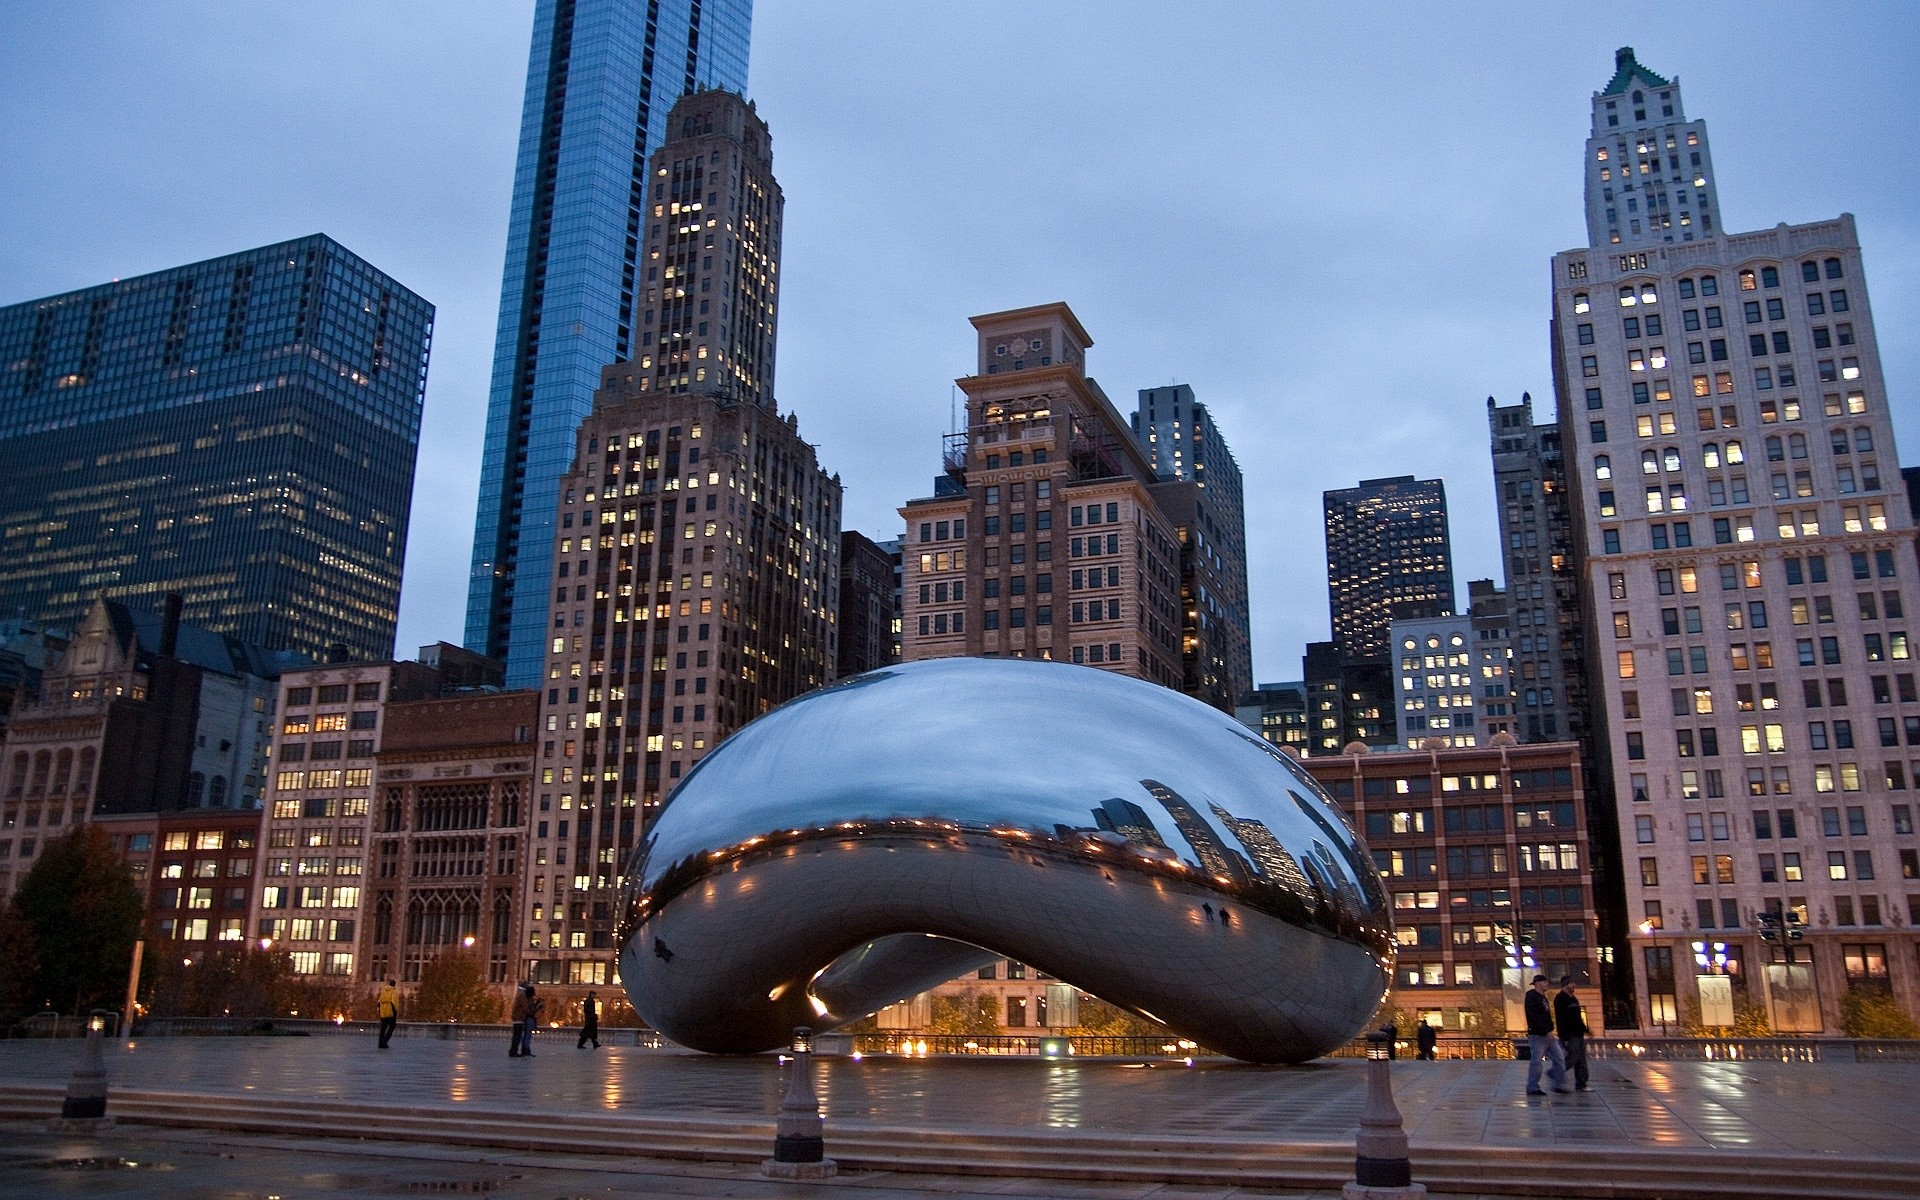 Chicago Wallpaper 1 Chicago Wallpaper 2 …